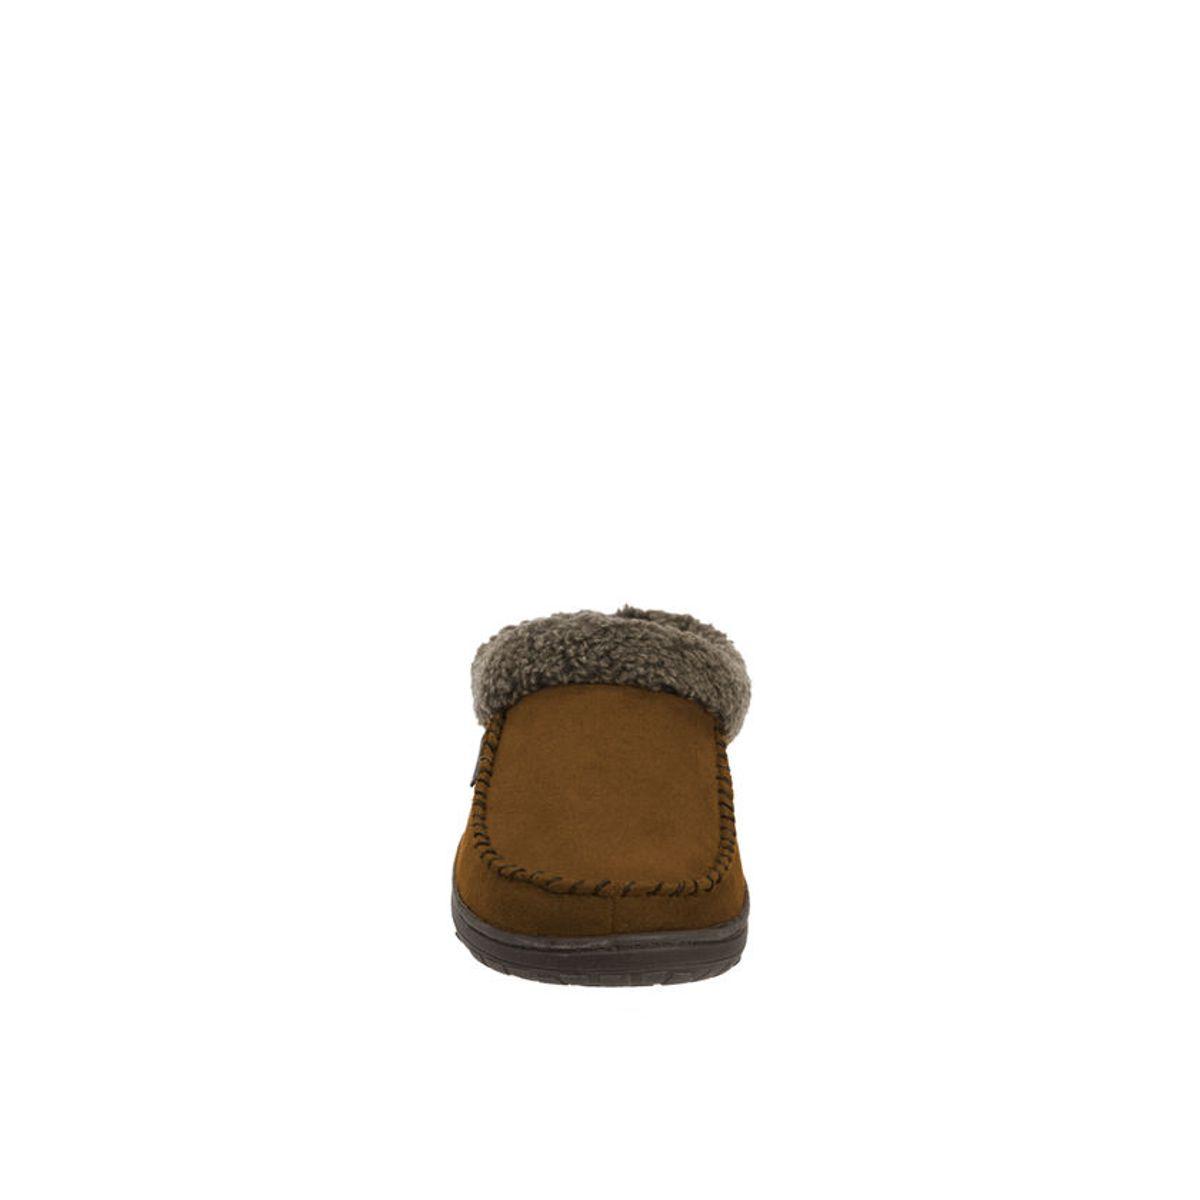 Feelinwow Microsuede Clog Slipper with Cuff Beige